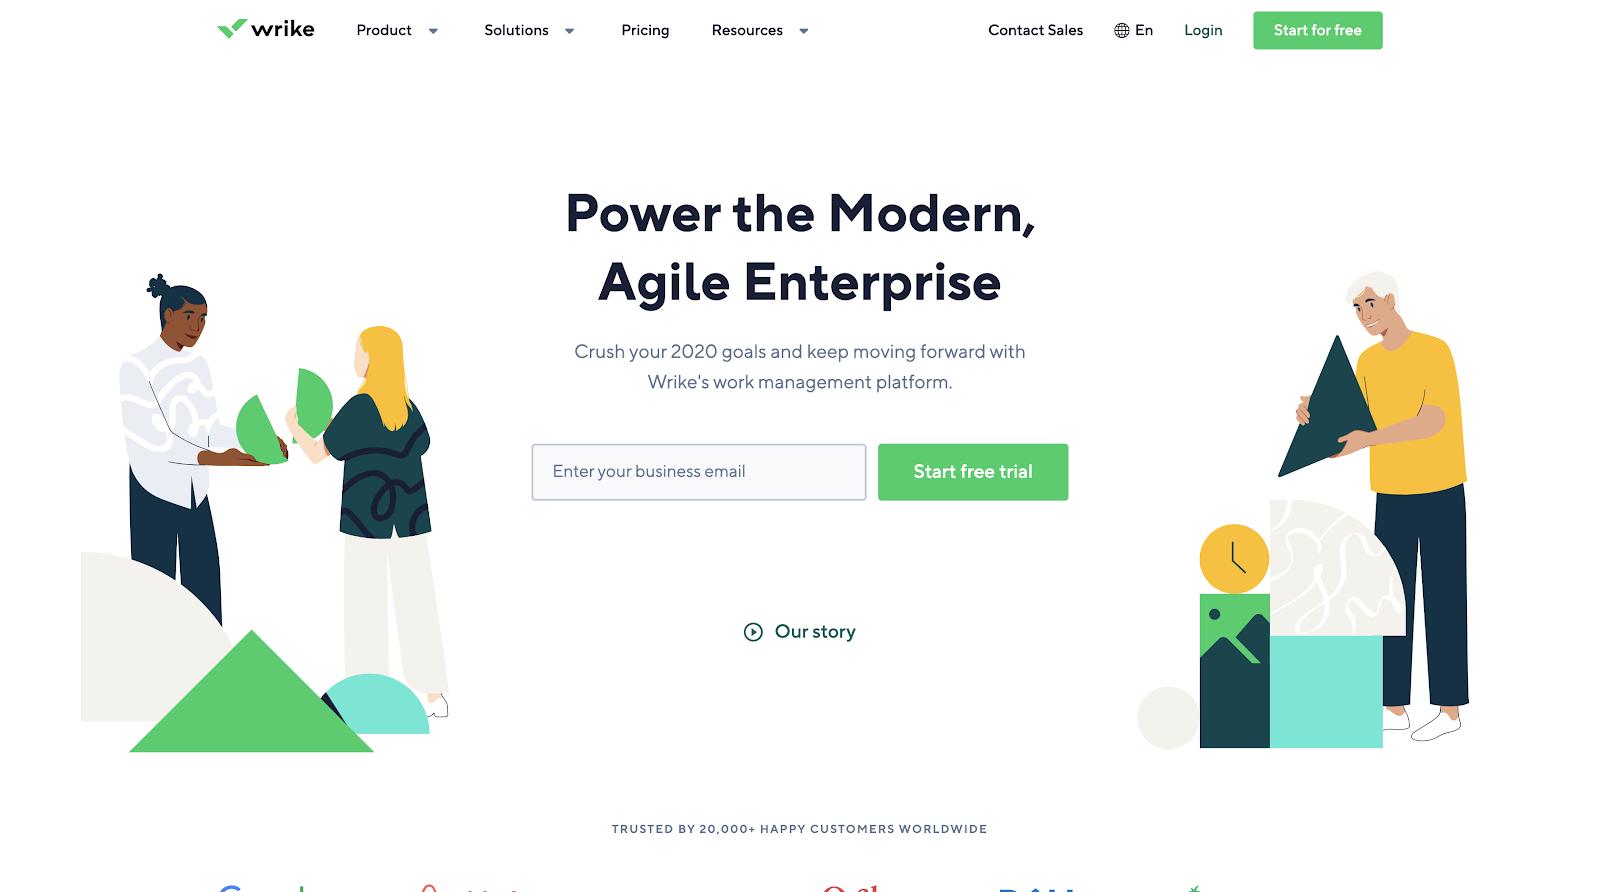 Wrike - Power the Modern, Agile Enterprise